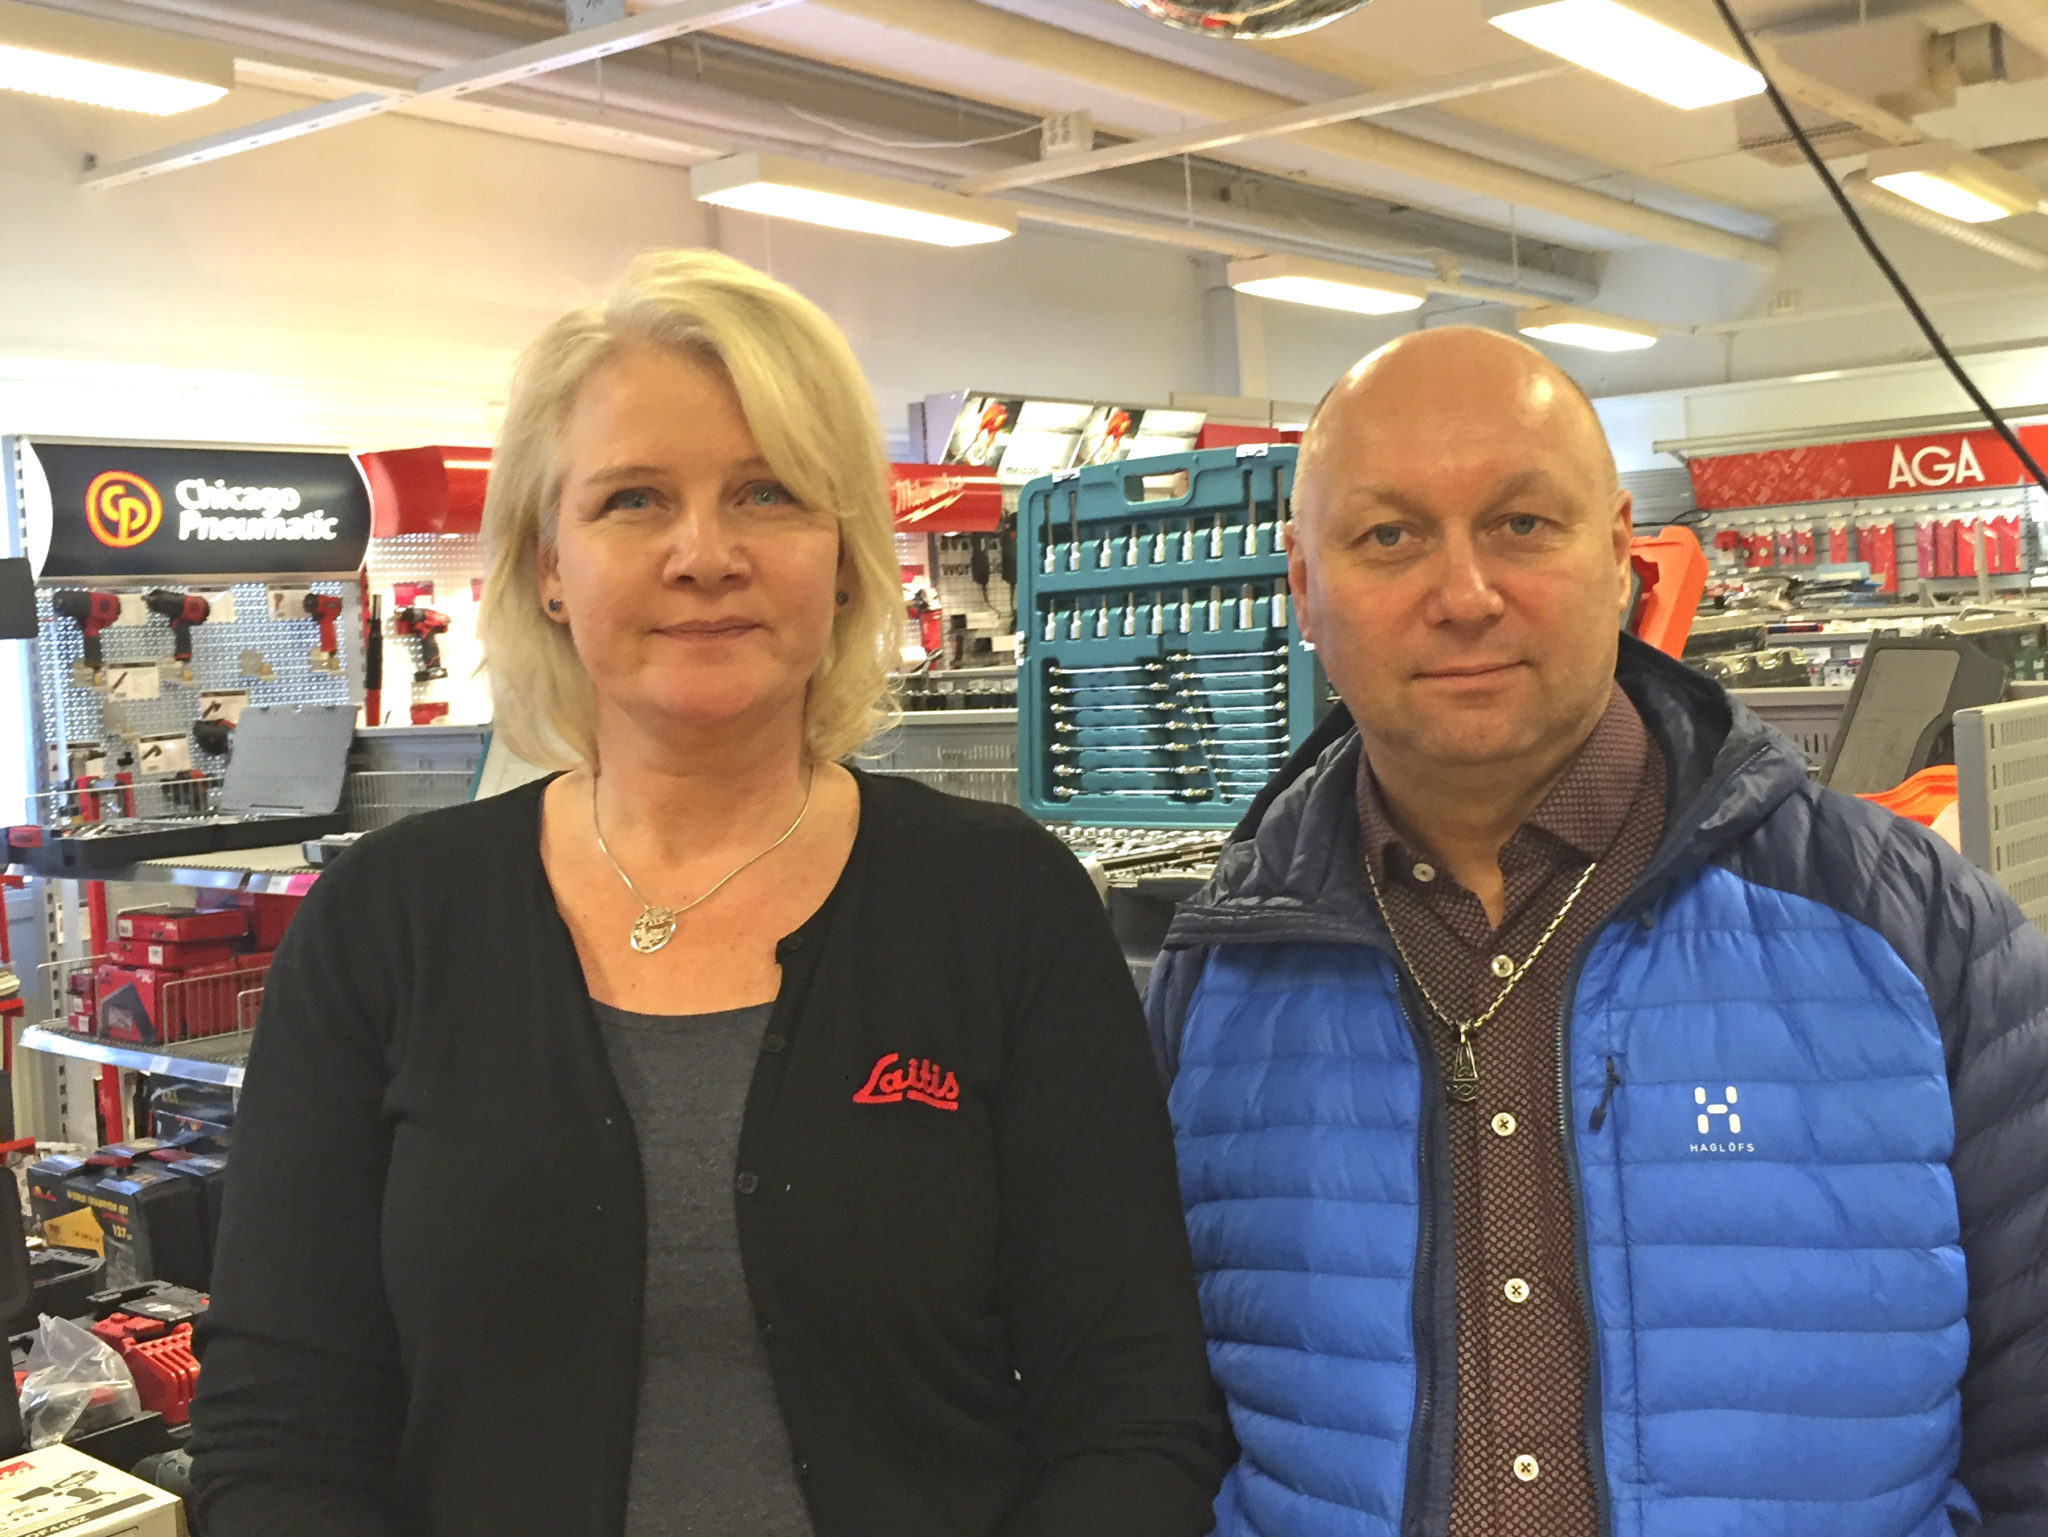 Laitis i Kiruna kör CrossMedia-abonnemang